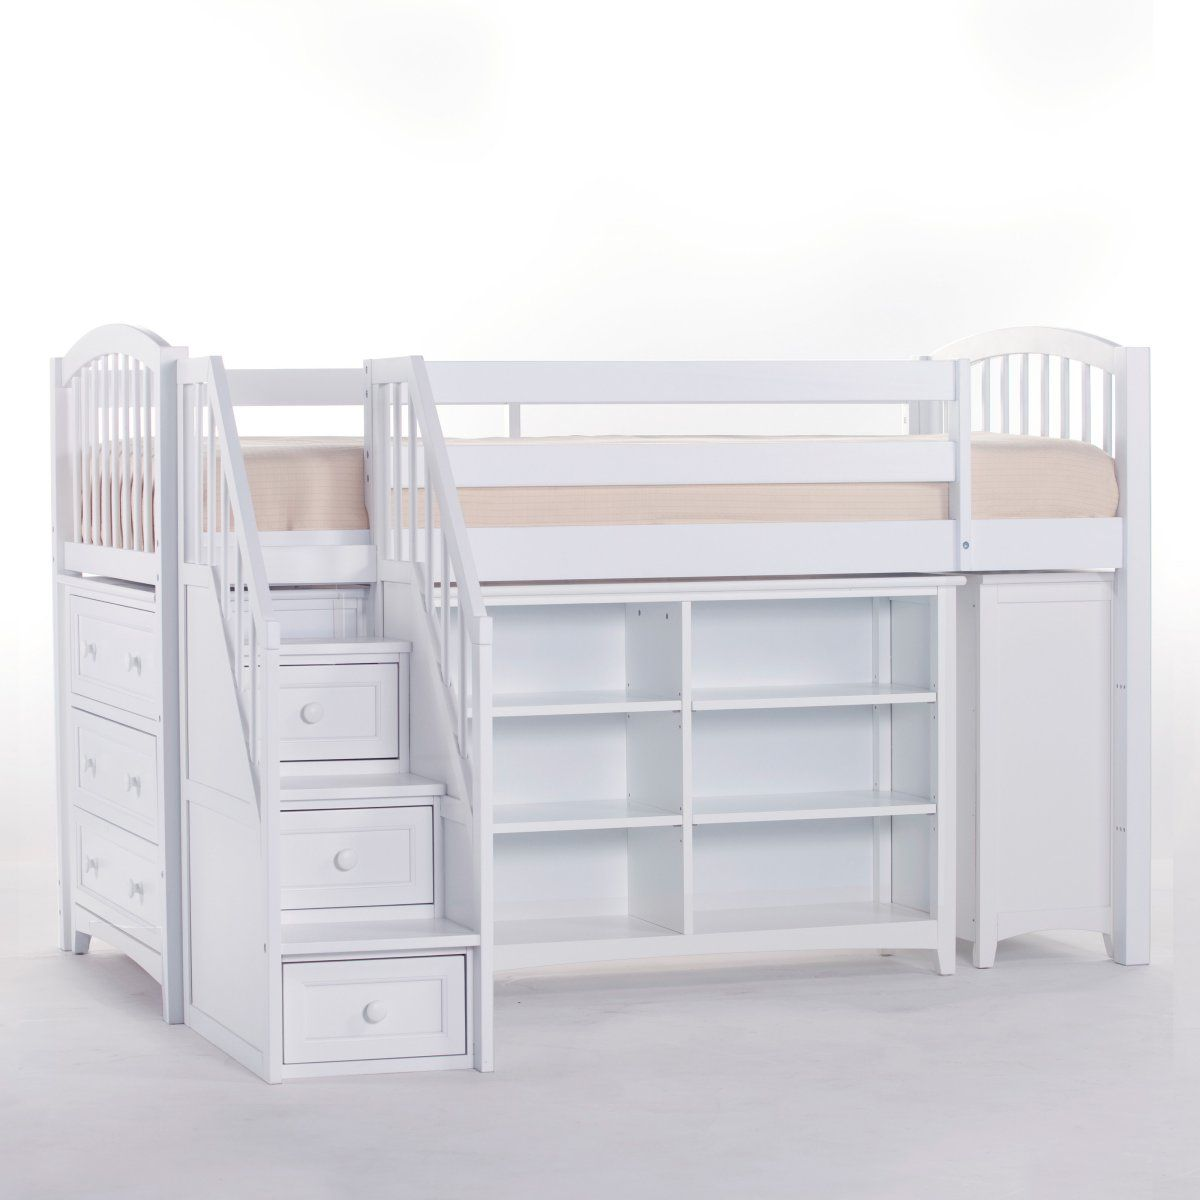 School House Storage Junior Loft With Stairs White Loft Beds